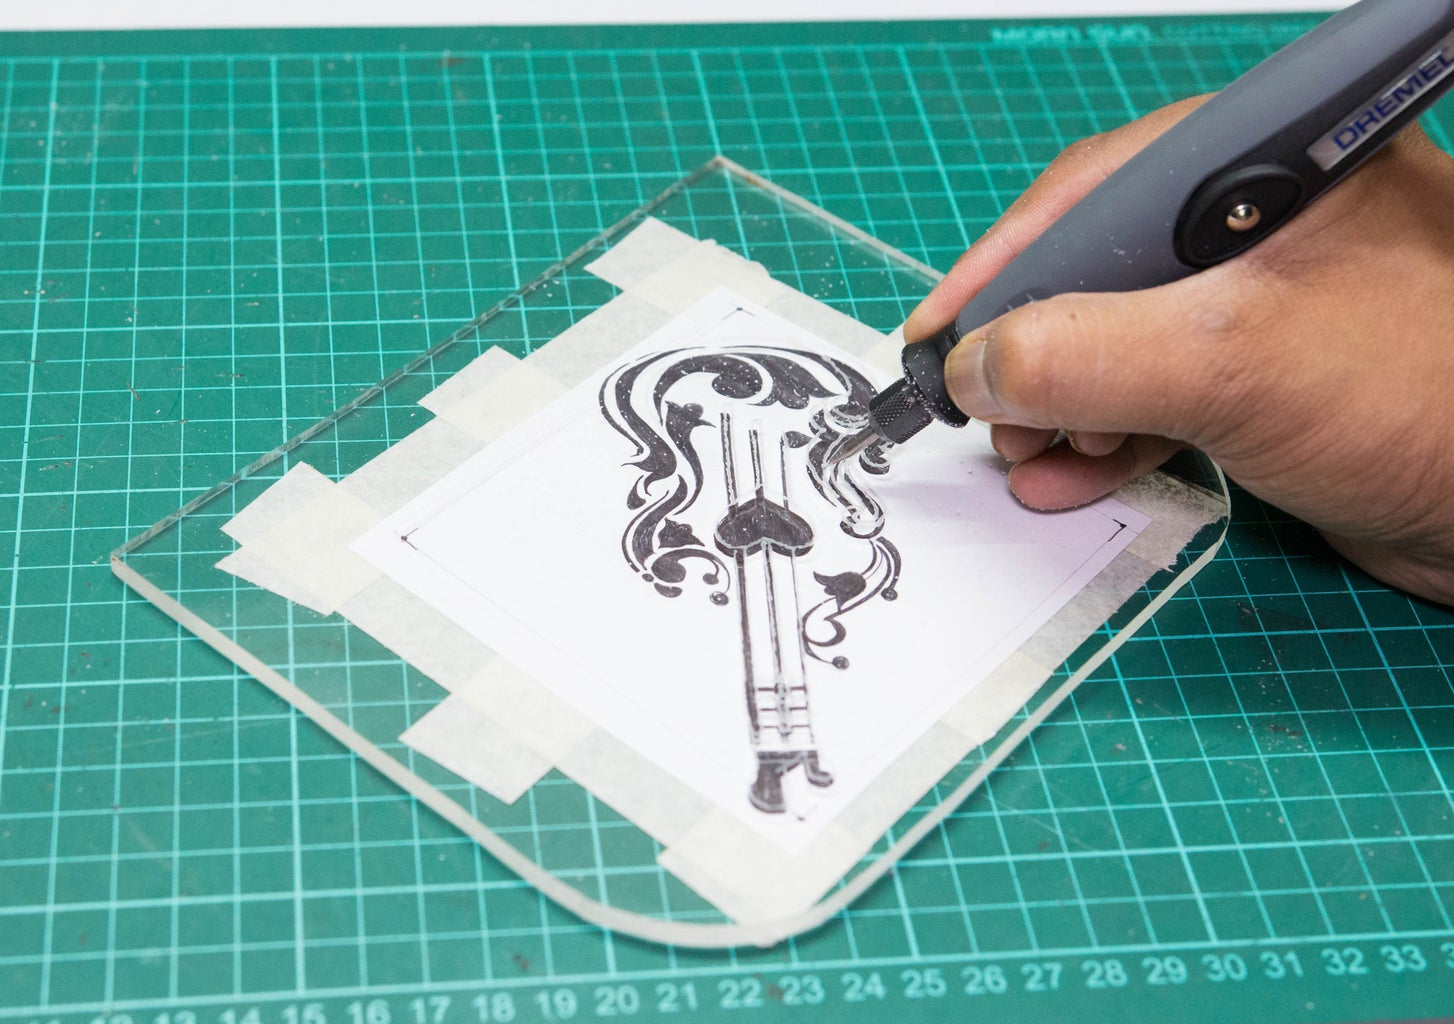 Etching the Acrylic Sheet